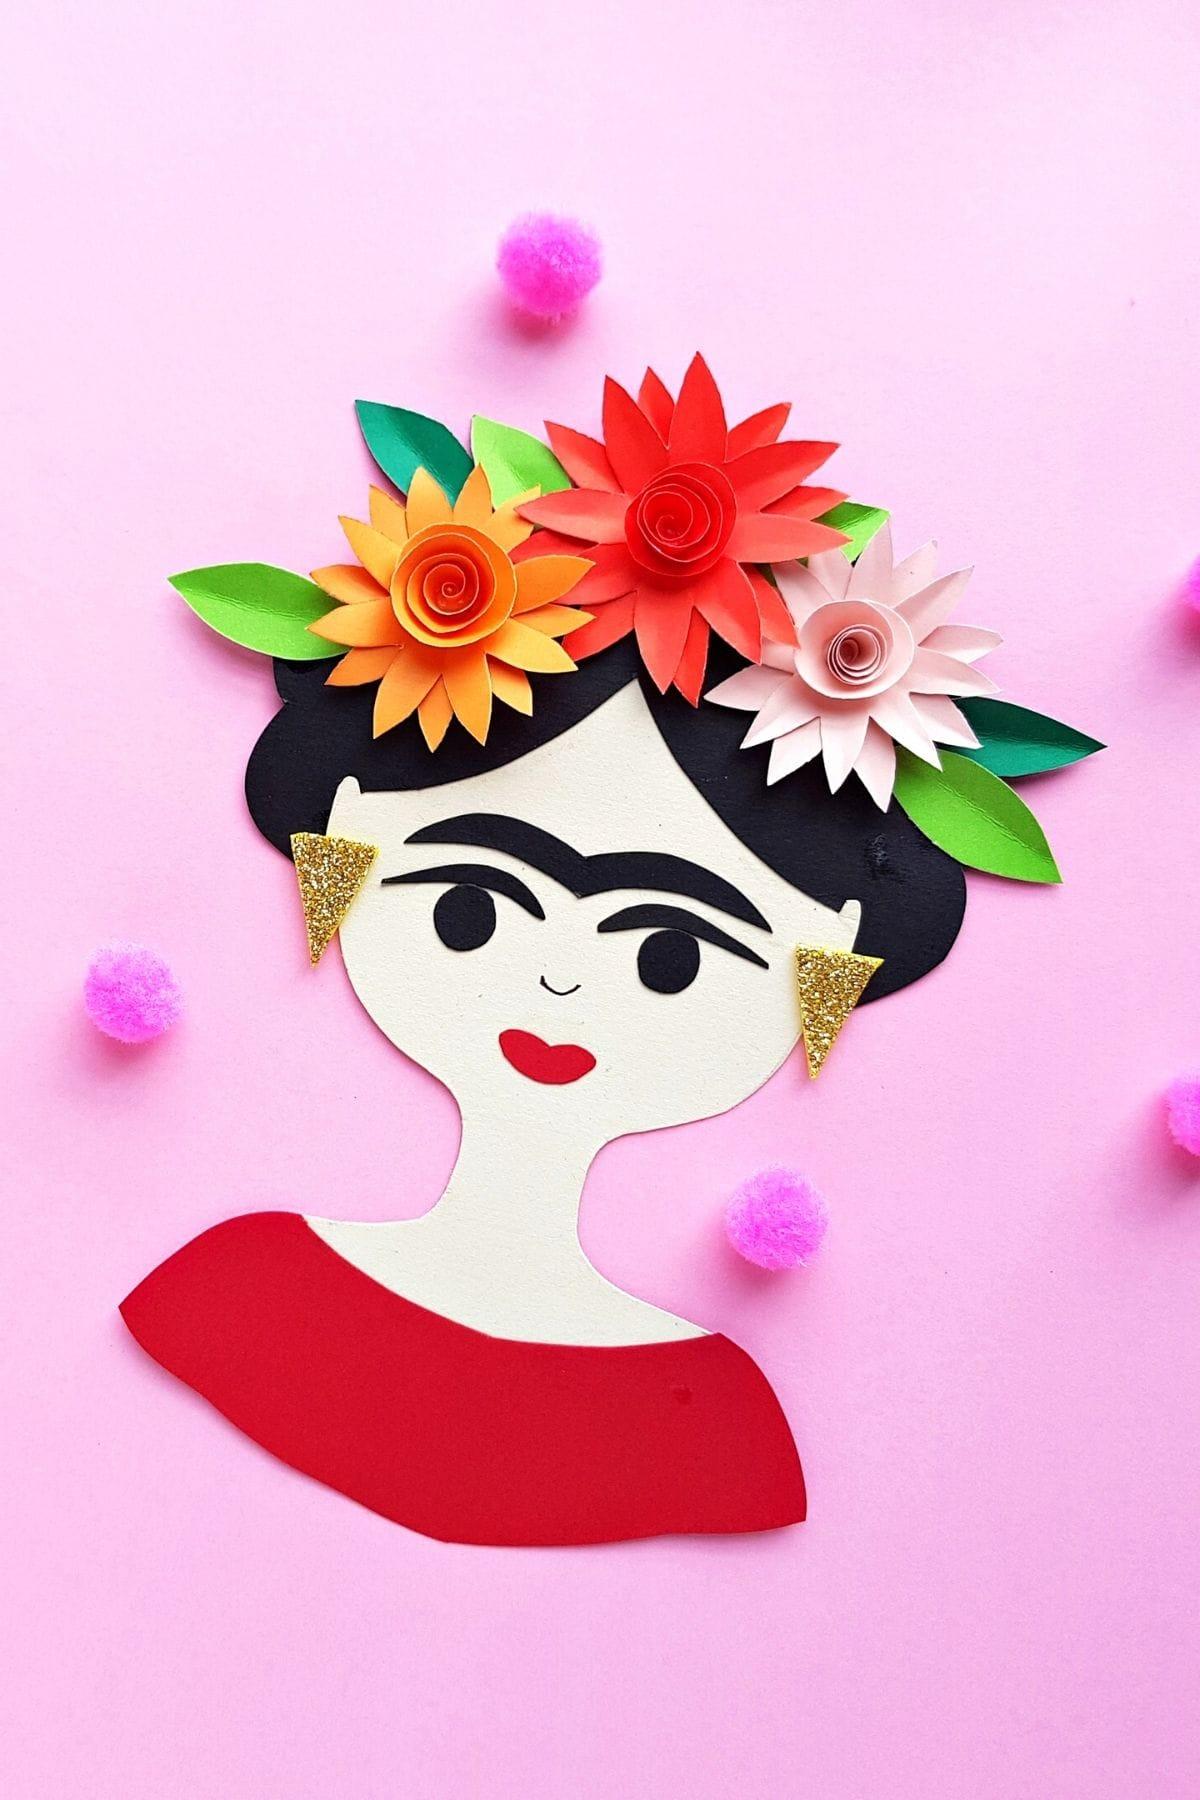 Frida Kahlo Craft with paper flower headband